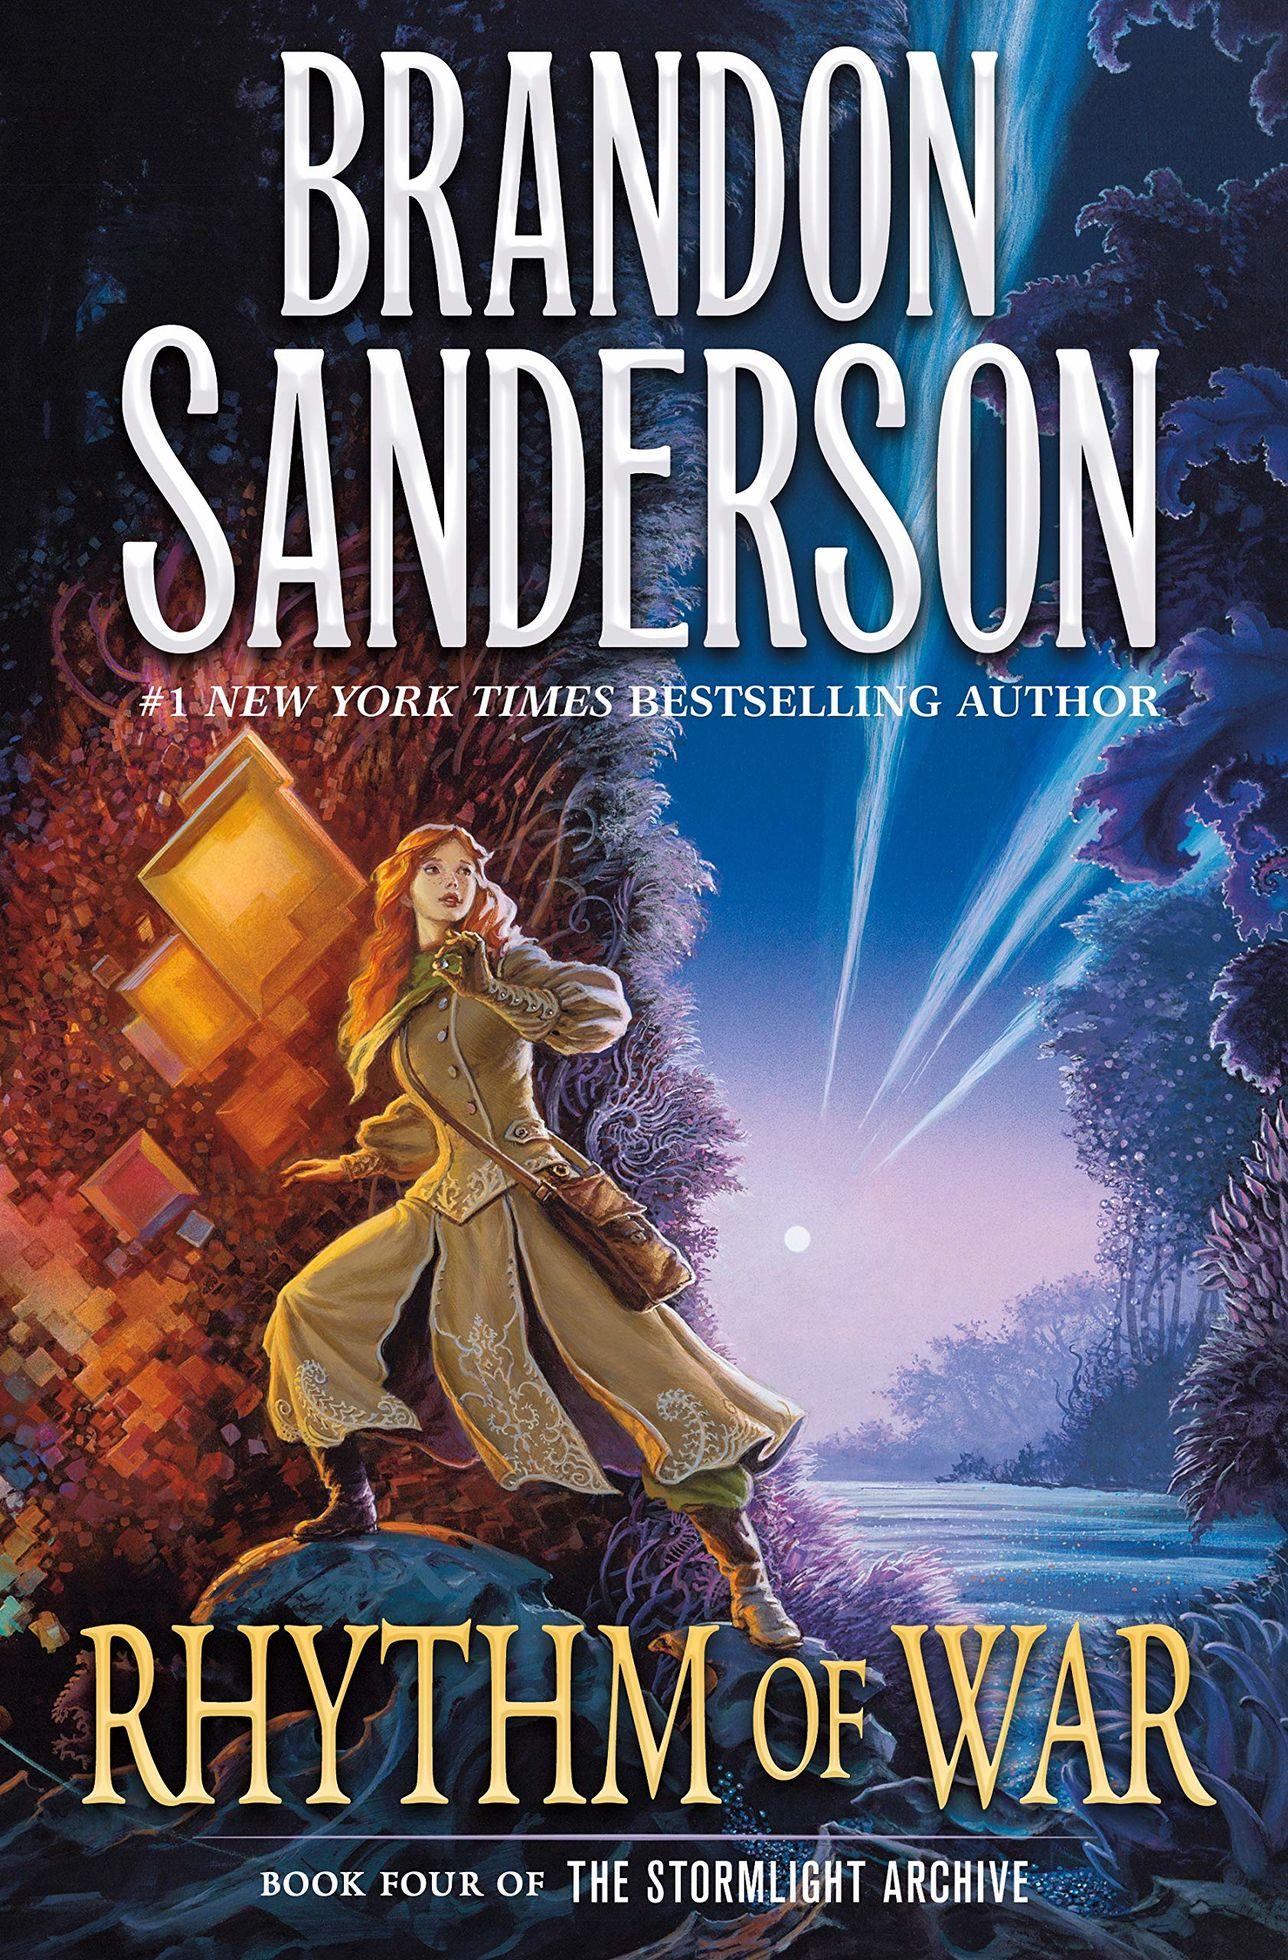 Rhythm of War - Brandon Sanderson sort un nouveau roman